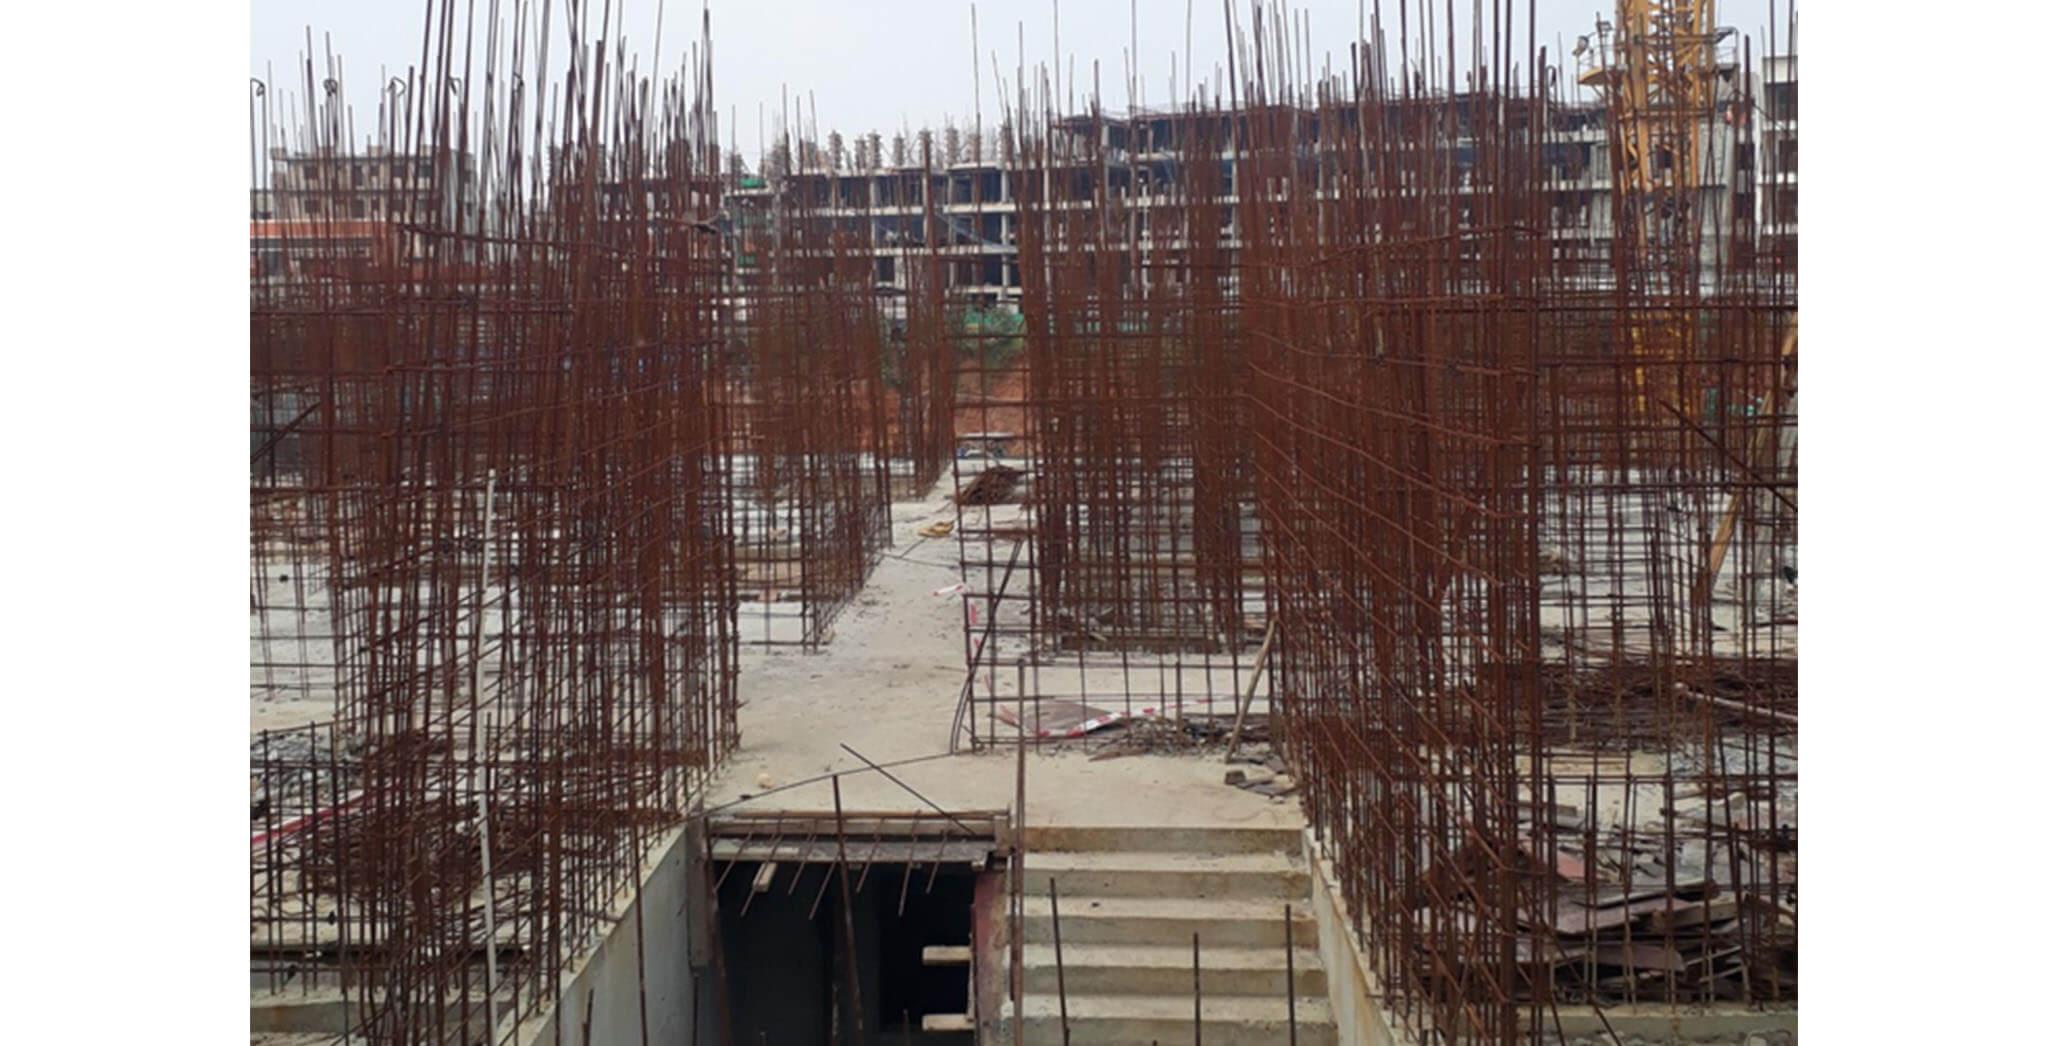 Oct 2020 - D Block: Ground floor slab completed